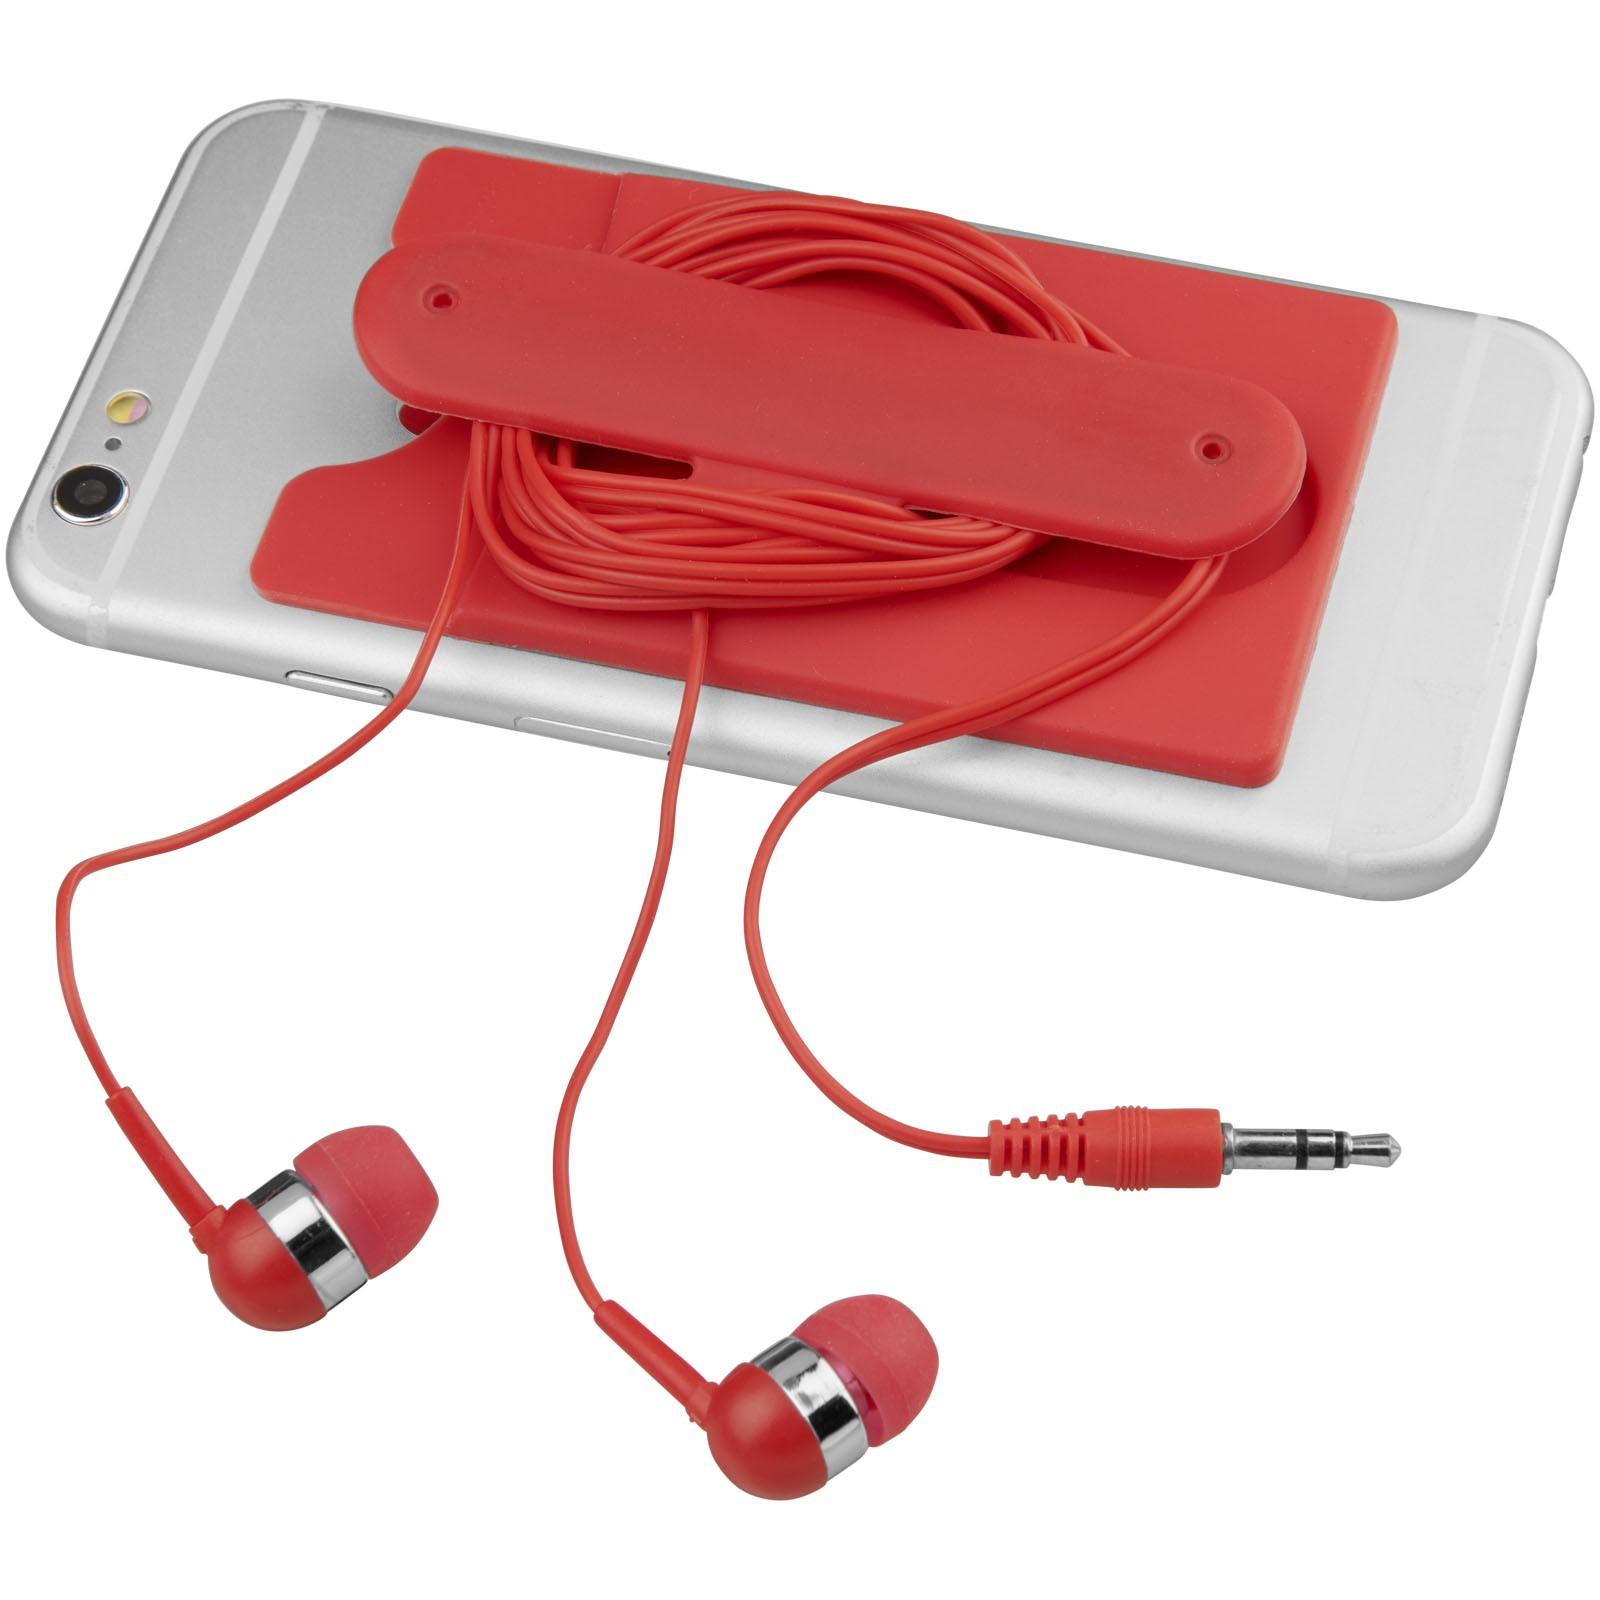 Wired Ohrhörer und Silikon Telefonhülle - Rot